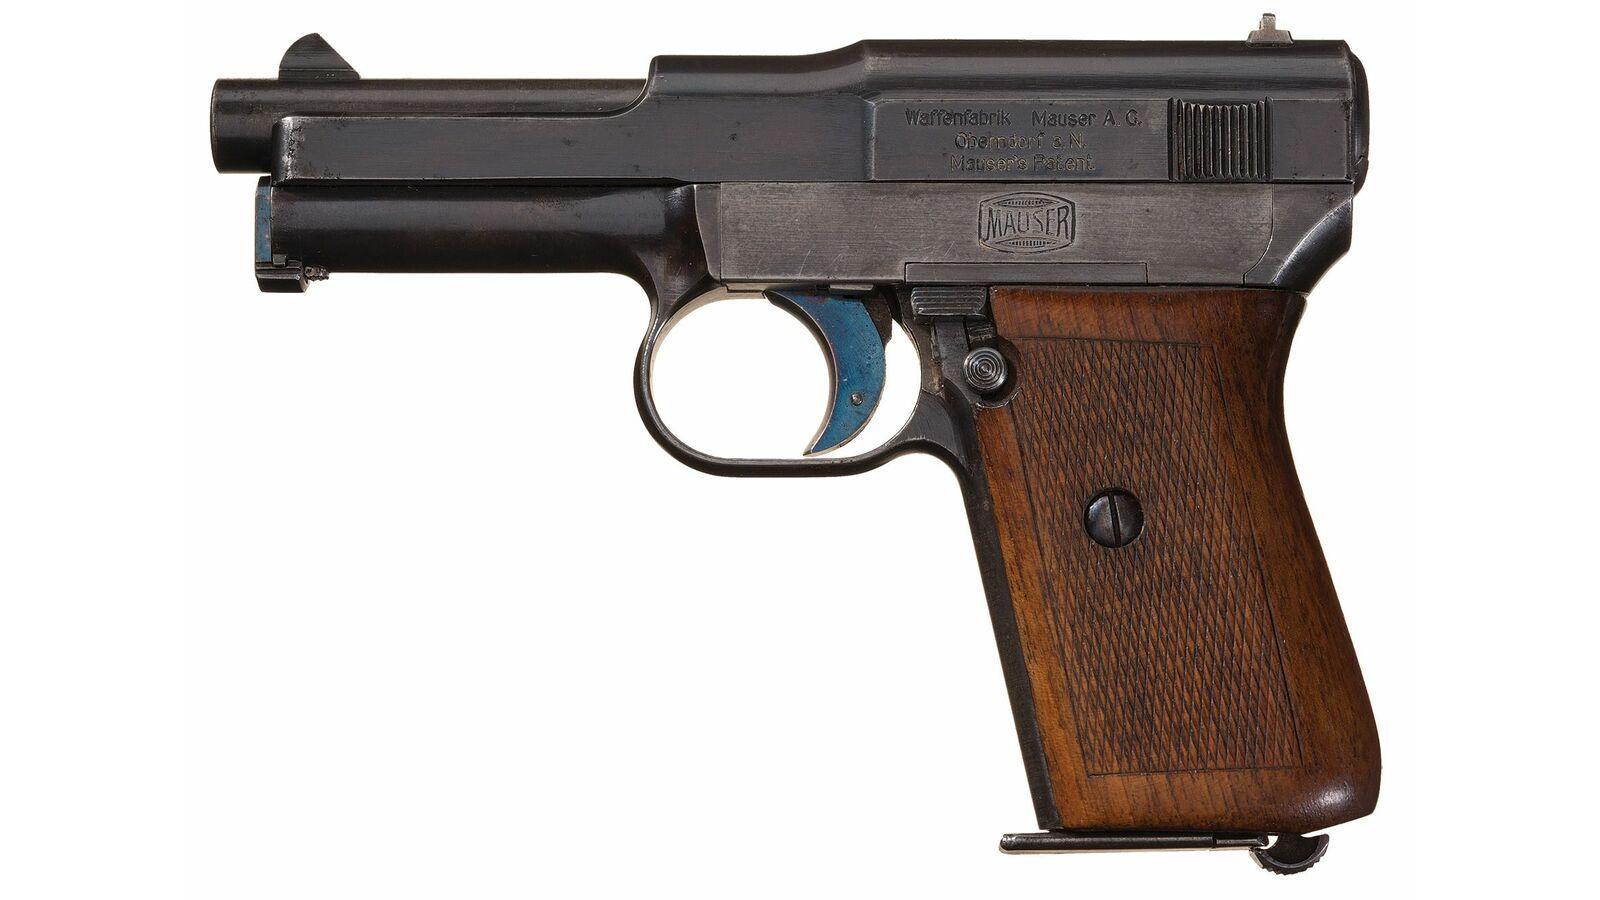 Rare Early Mauser Model 1914 'Humpback' Pocket Pistol